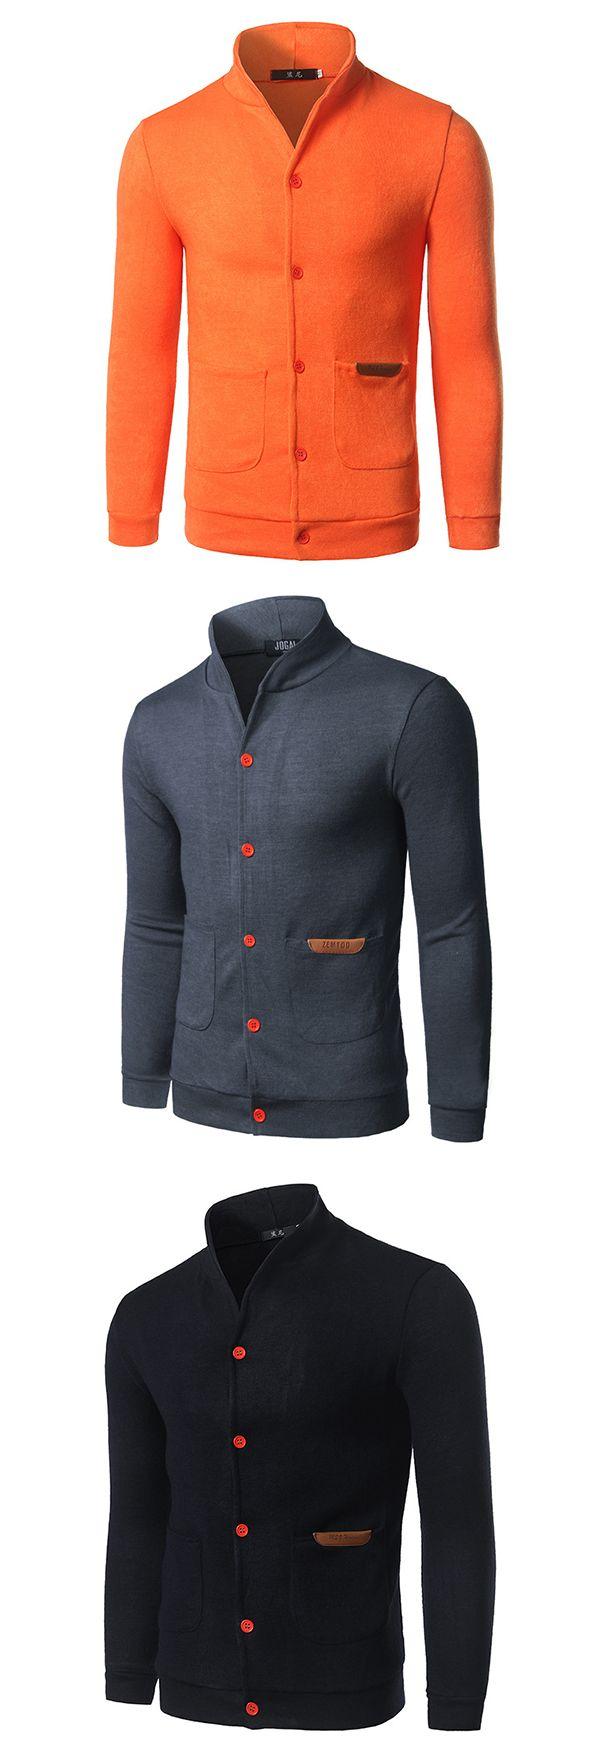 US$19.77 Mens Fashion Solid Slim Fit Knit Cardigan